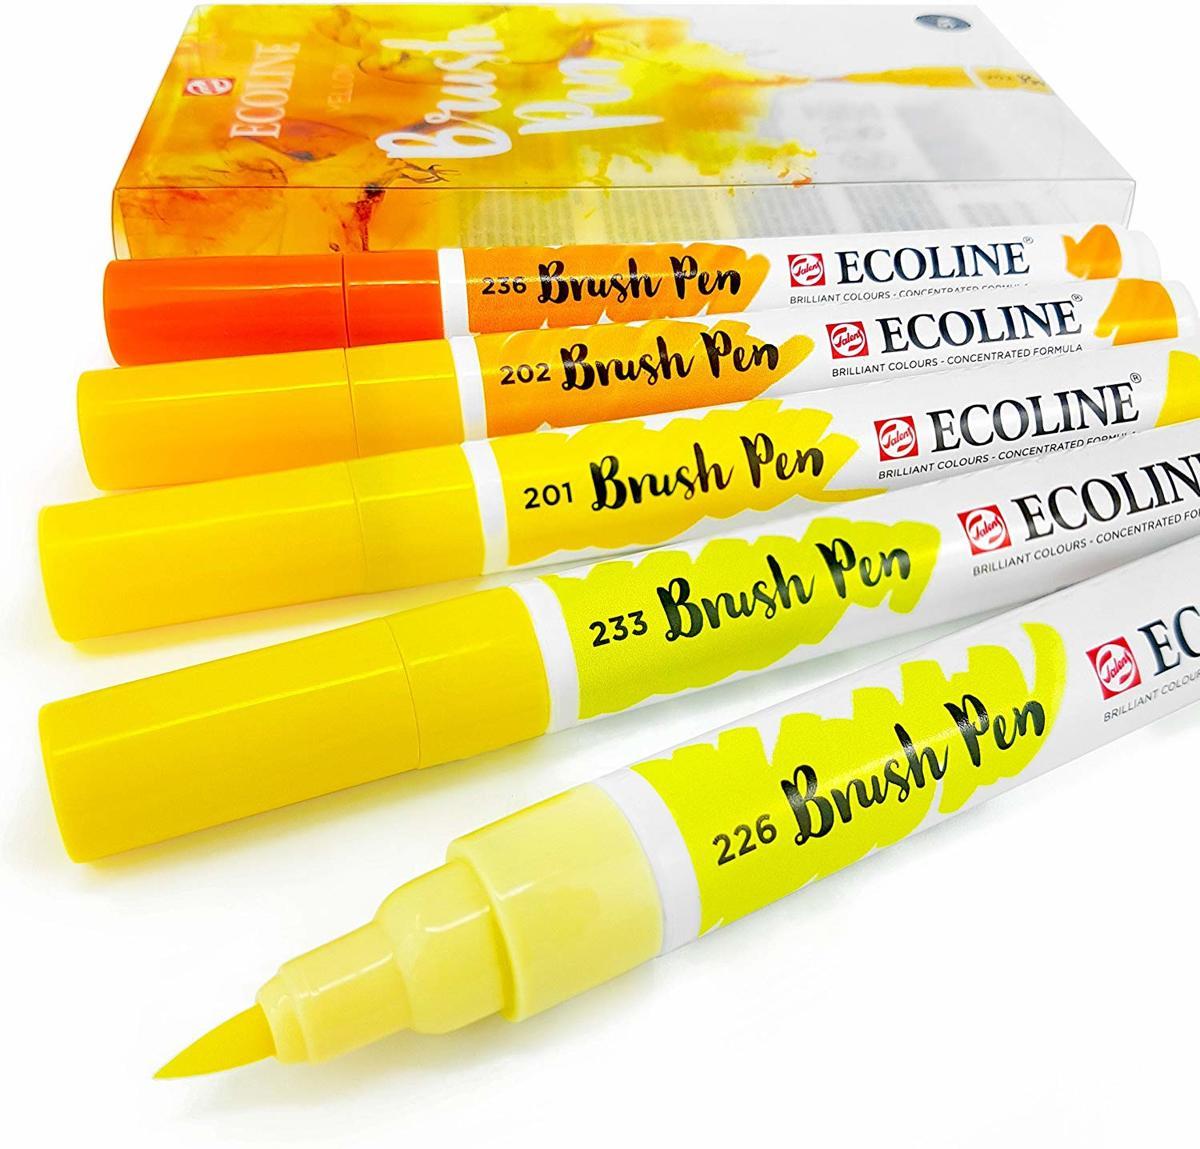 Talens Ecoline Brushpen Set met 5 Pennen (Geel) + 1 Brush Pen Blender verpakt in een handige Zipperbag + 1 x A4 Ecoline/aquarelblok + Basis Boekje Brush/Handlettering